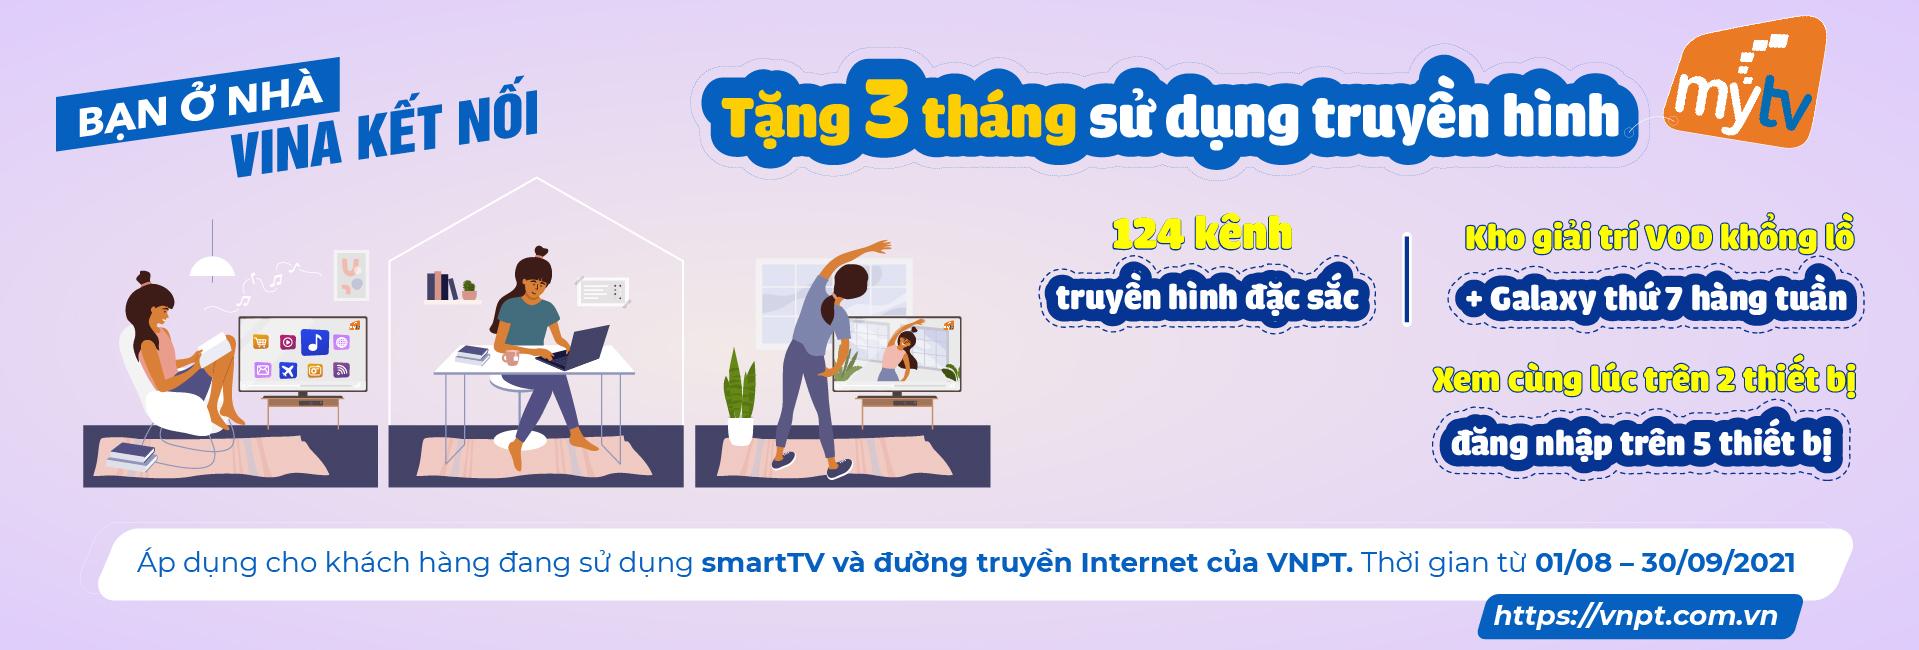 MYTV TẶNG 3 THÁNG